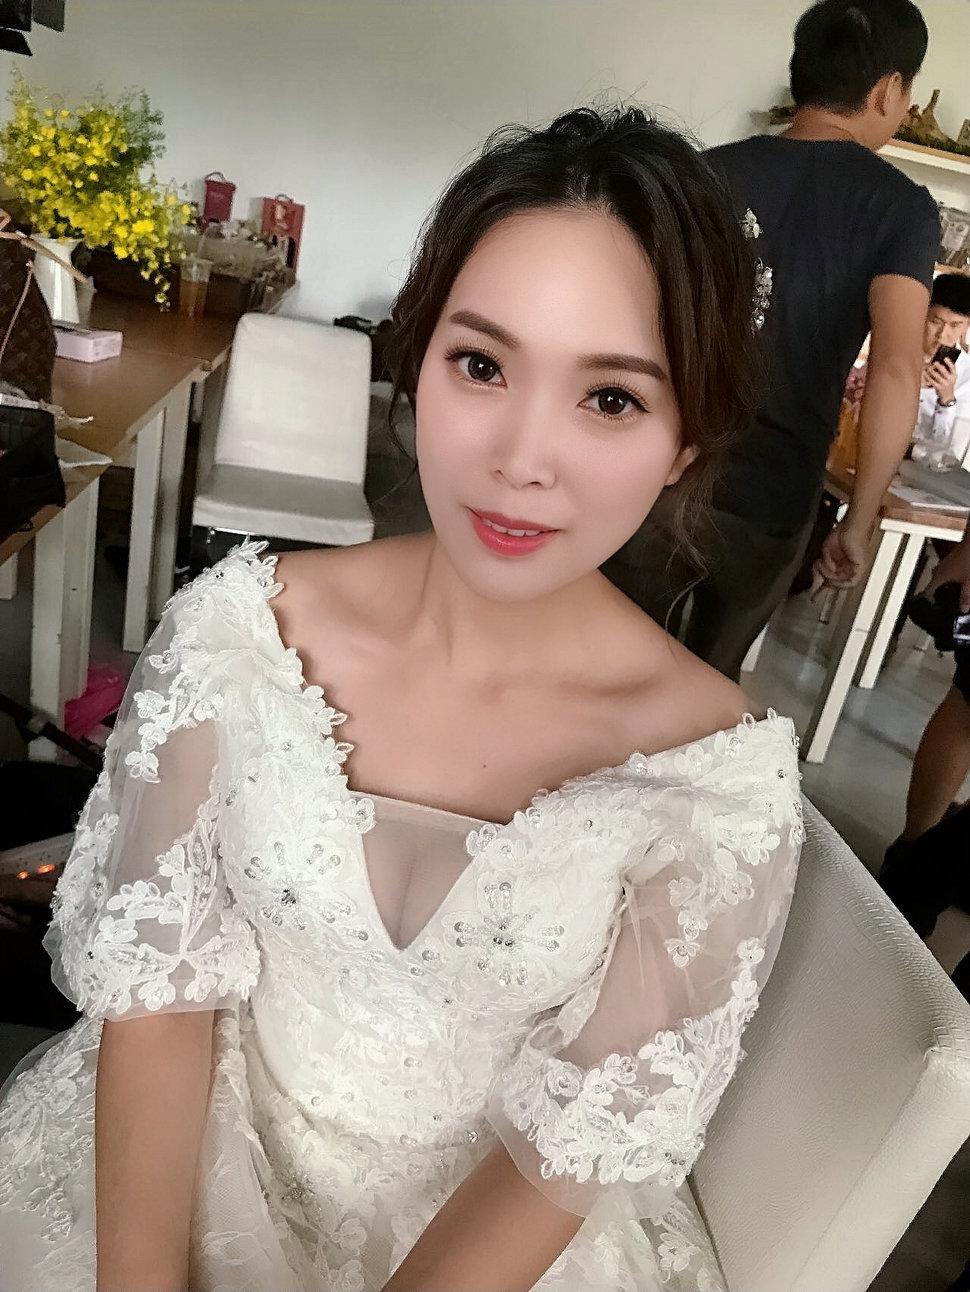 155C3961-1780-4F4D-B3D4-348305288FF2 - 全台新祕 銘鴻 Hong stylist《結婚吧》